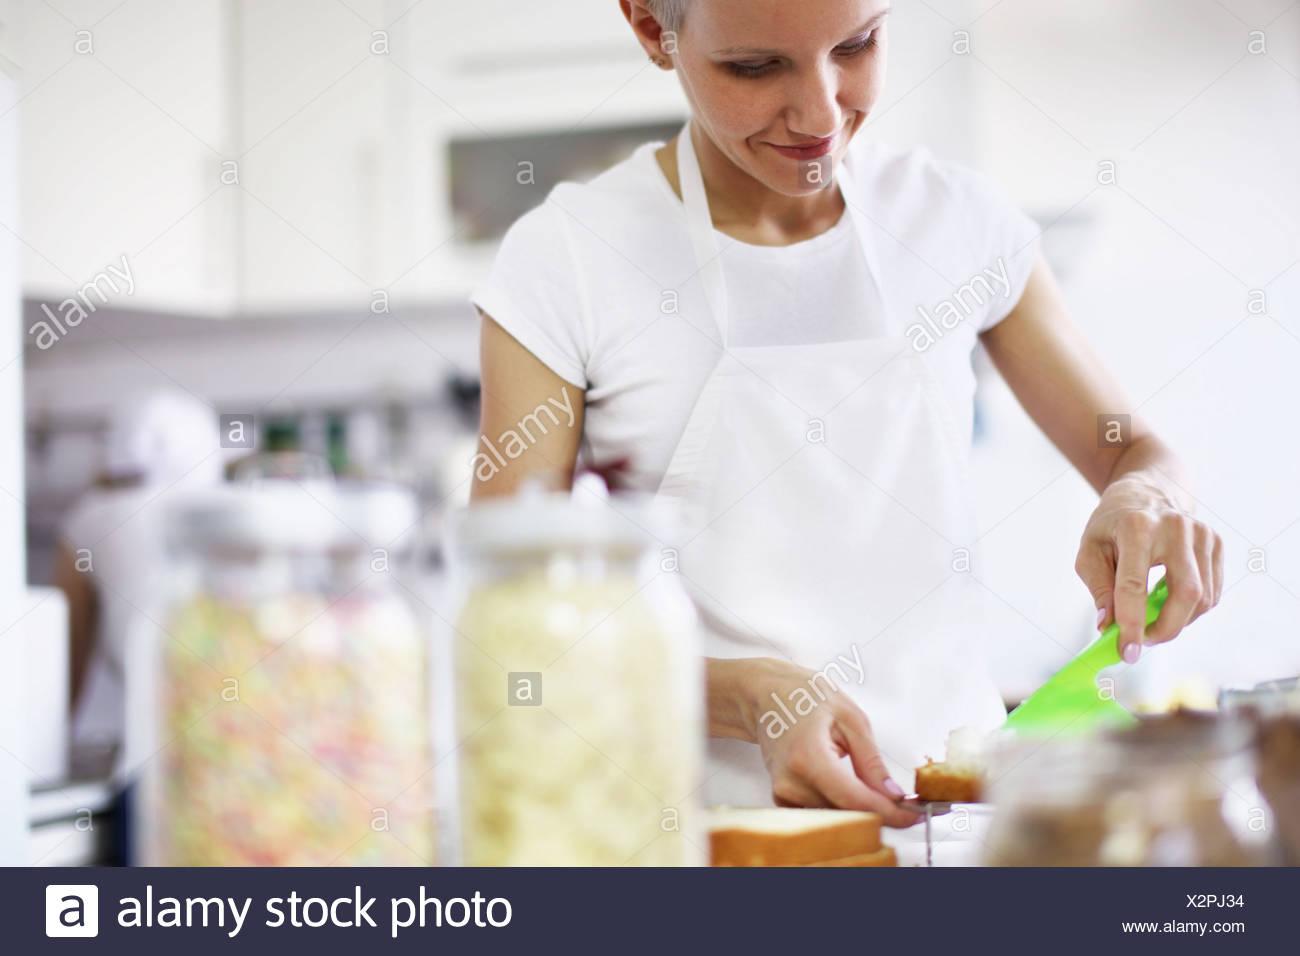 Woman decorating cake - Stock Image